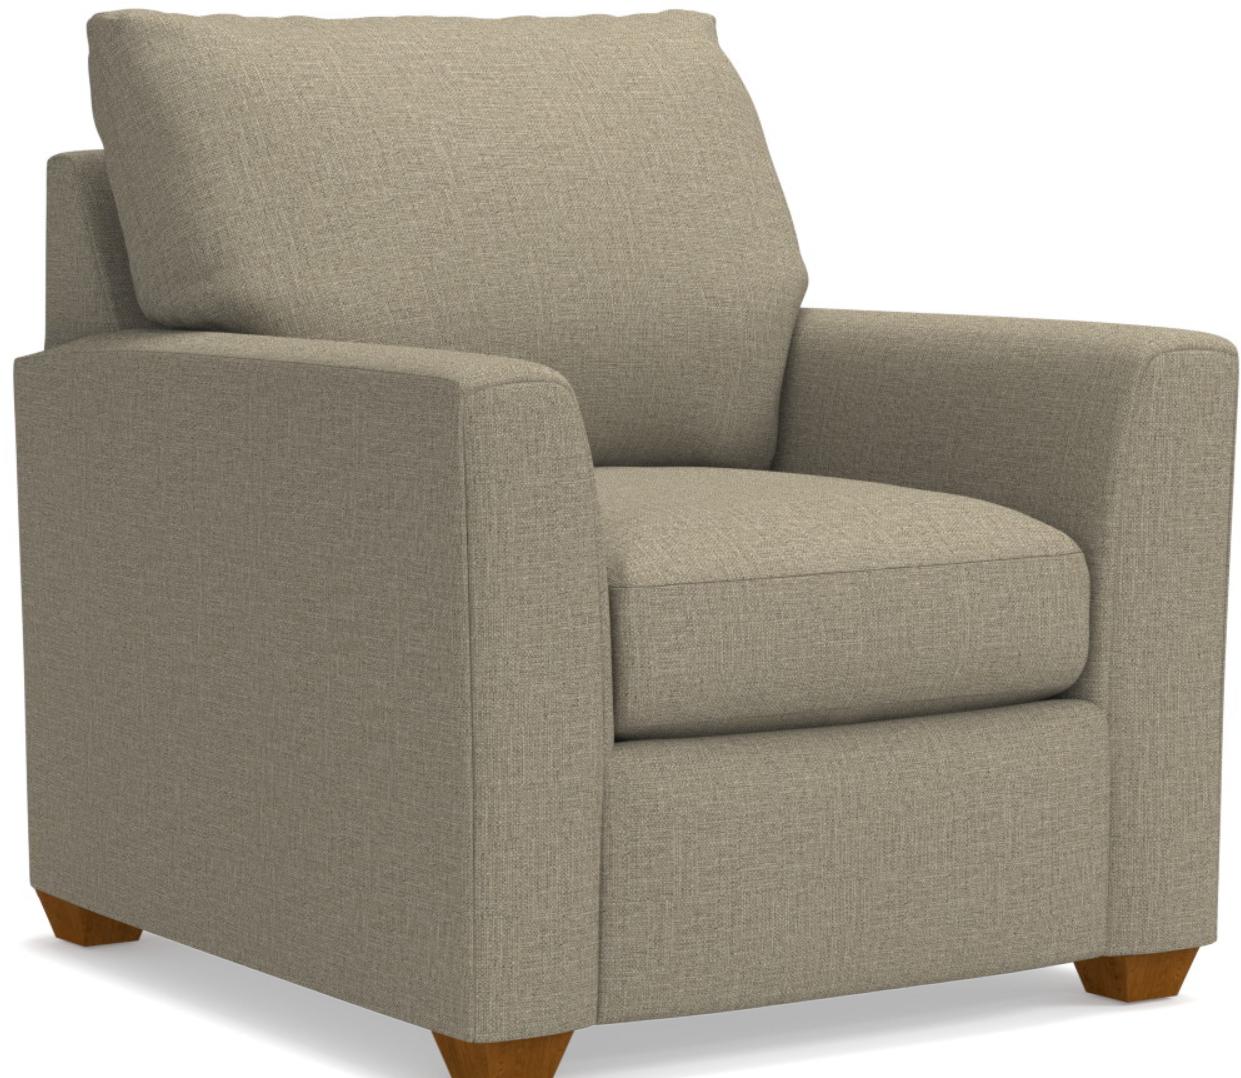 Miraculous Accent Chairs Laffertys Home Center Inzonedesignstudio Interior Chair Design Inzonedesignstudiocom